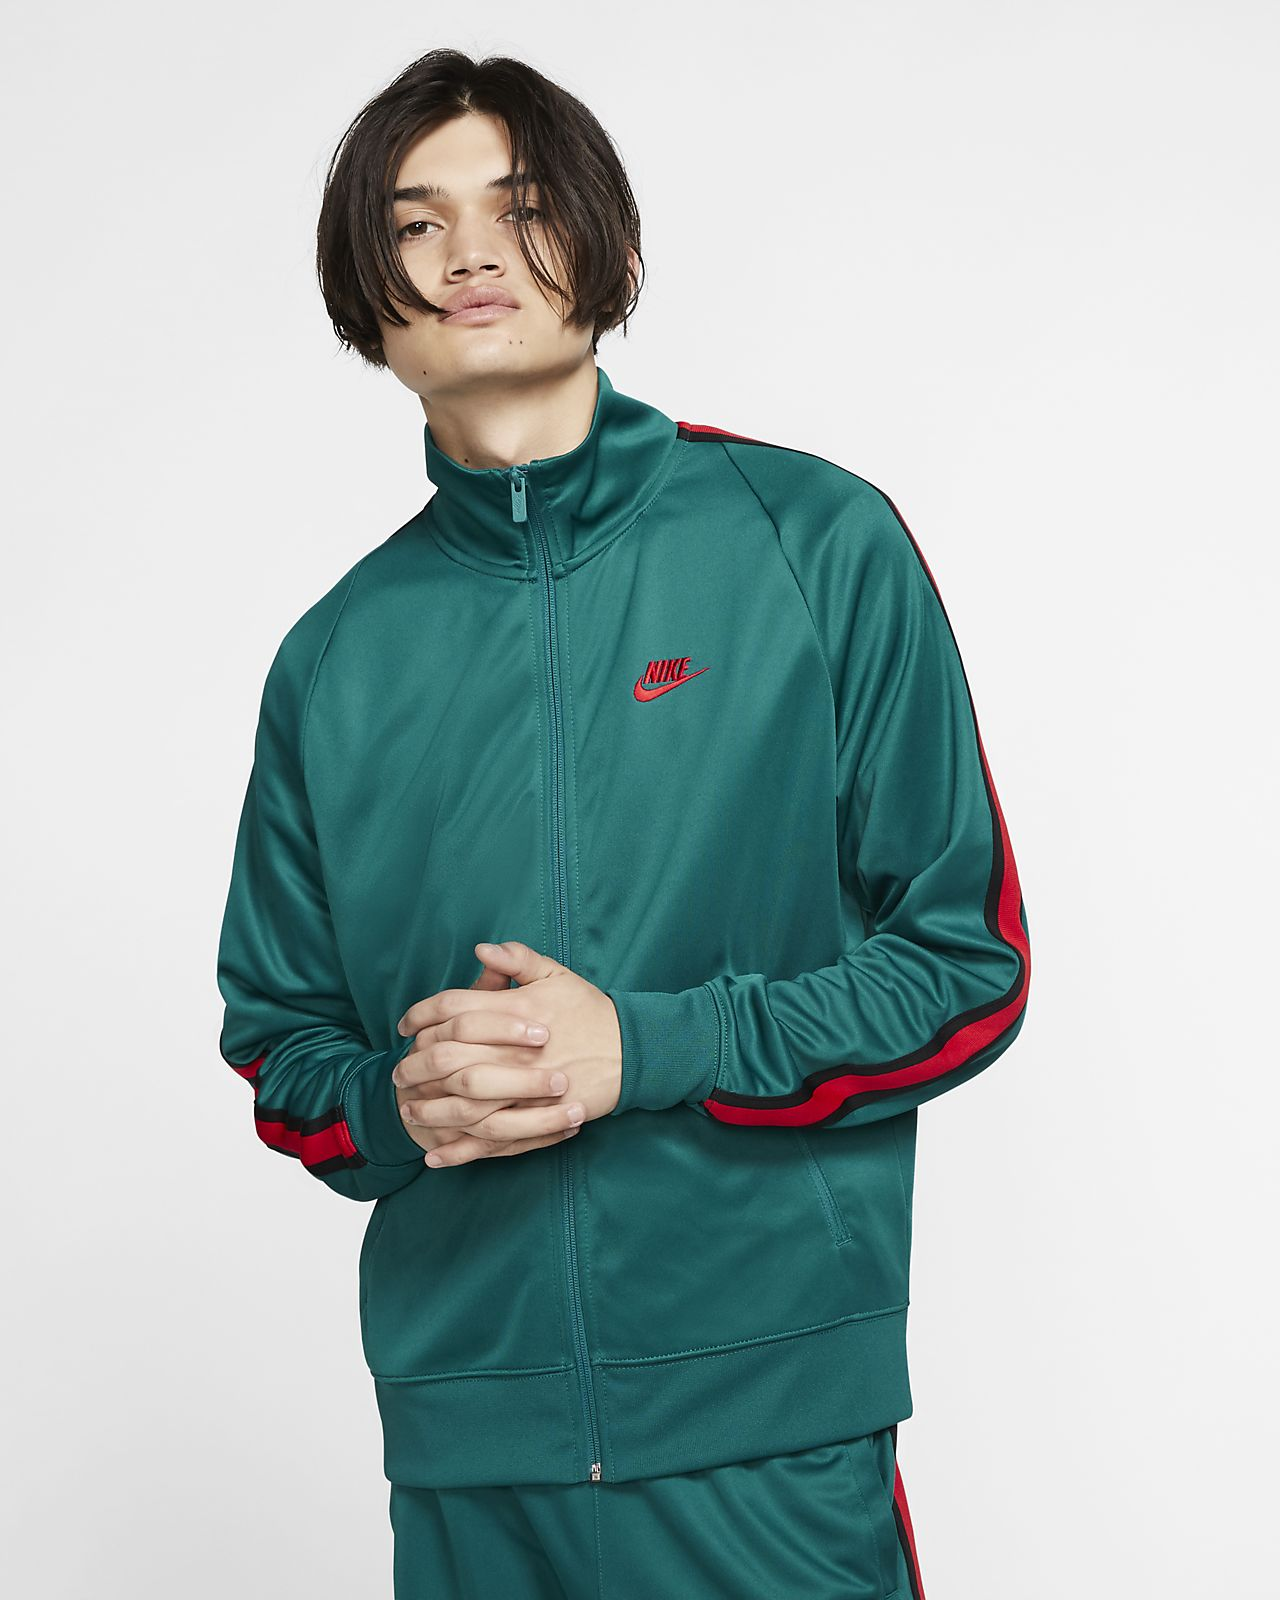 ada5db143 Nike Sportswear N98 Men's Knit Warm-Up Jacket. Nike.com